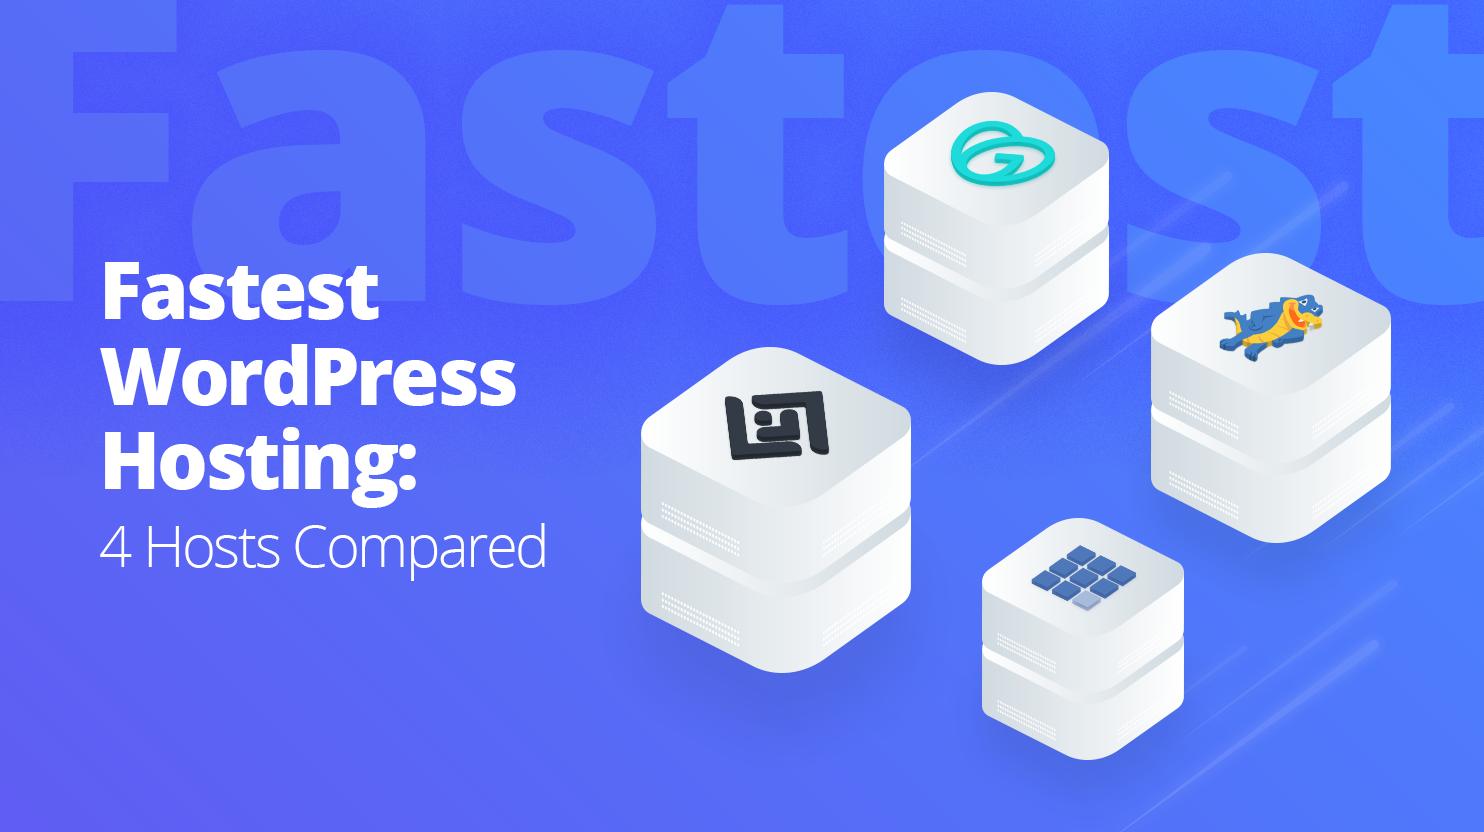 4 servers with 10web, godaddy, bluehost, hostgator logo, next to it says: fastest wordpress hosting 4 hosts compared